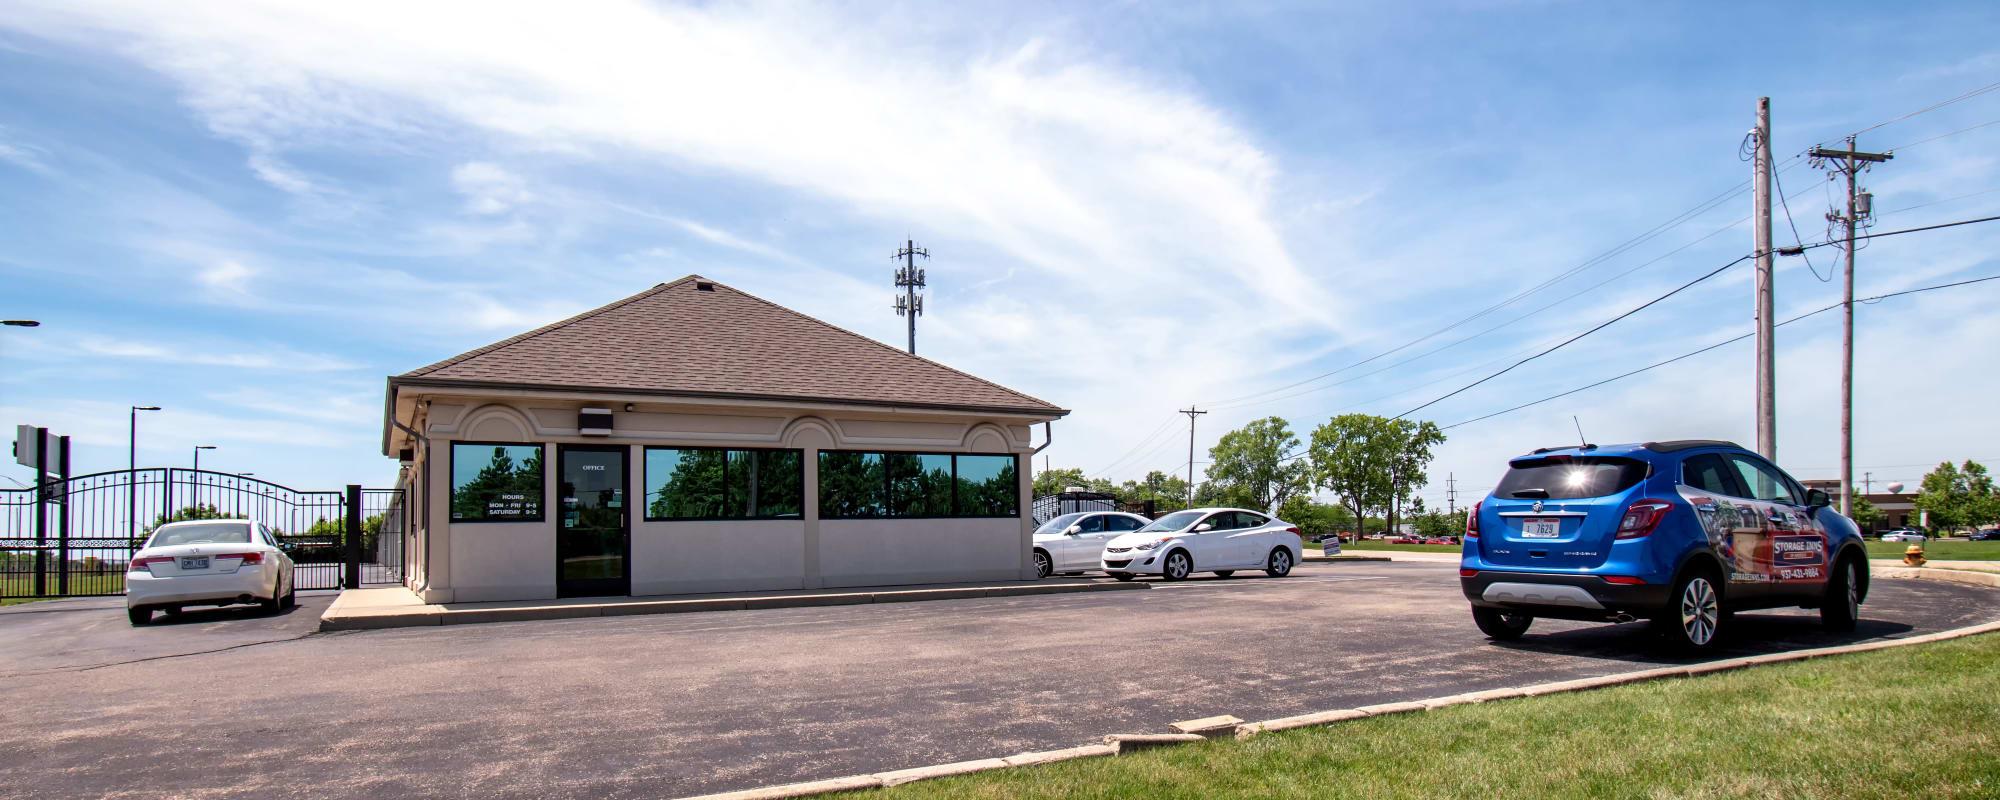 Storage Inns of America in Beavercreek, Ohio